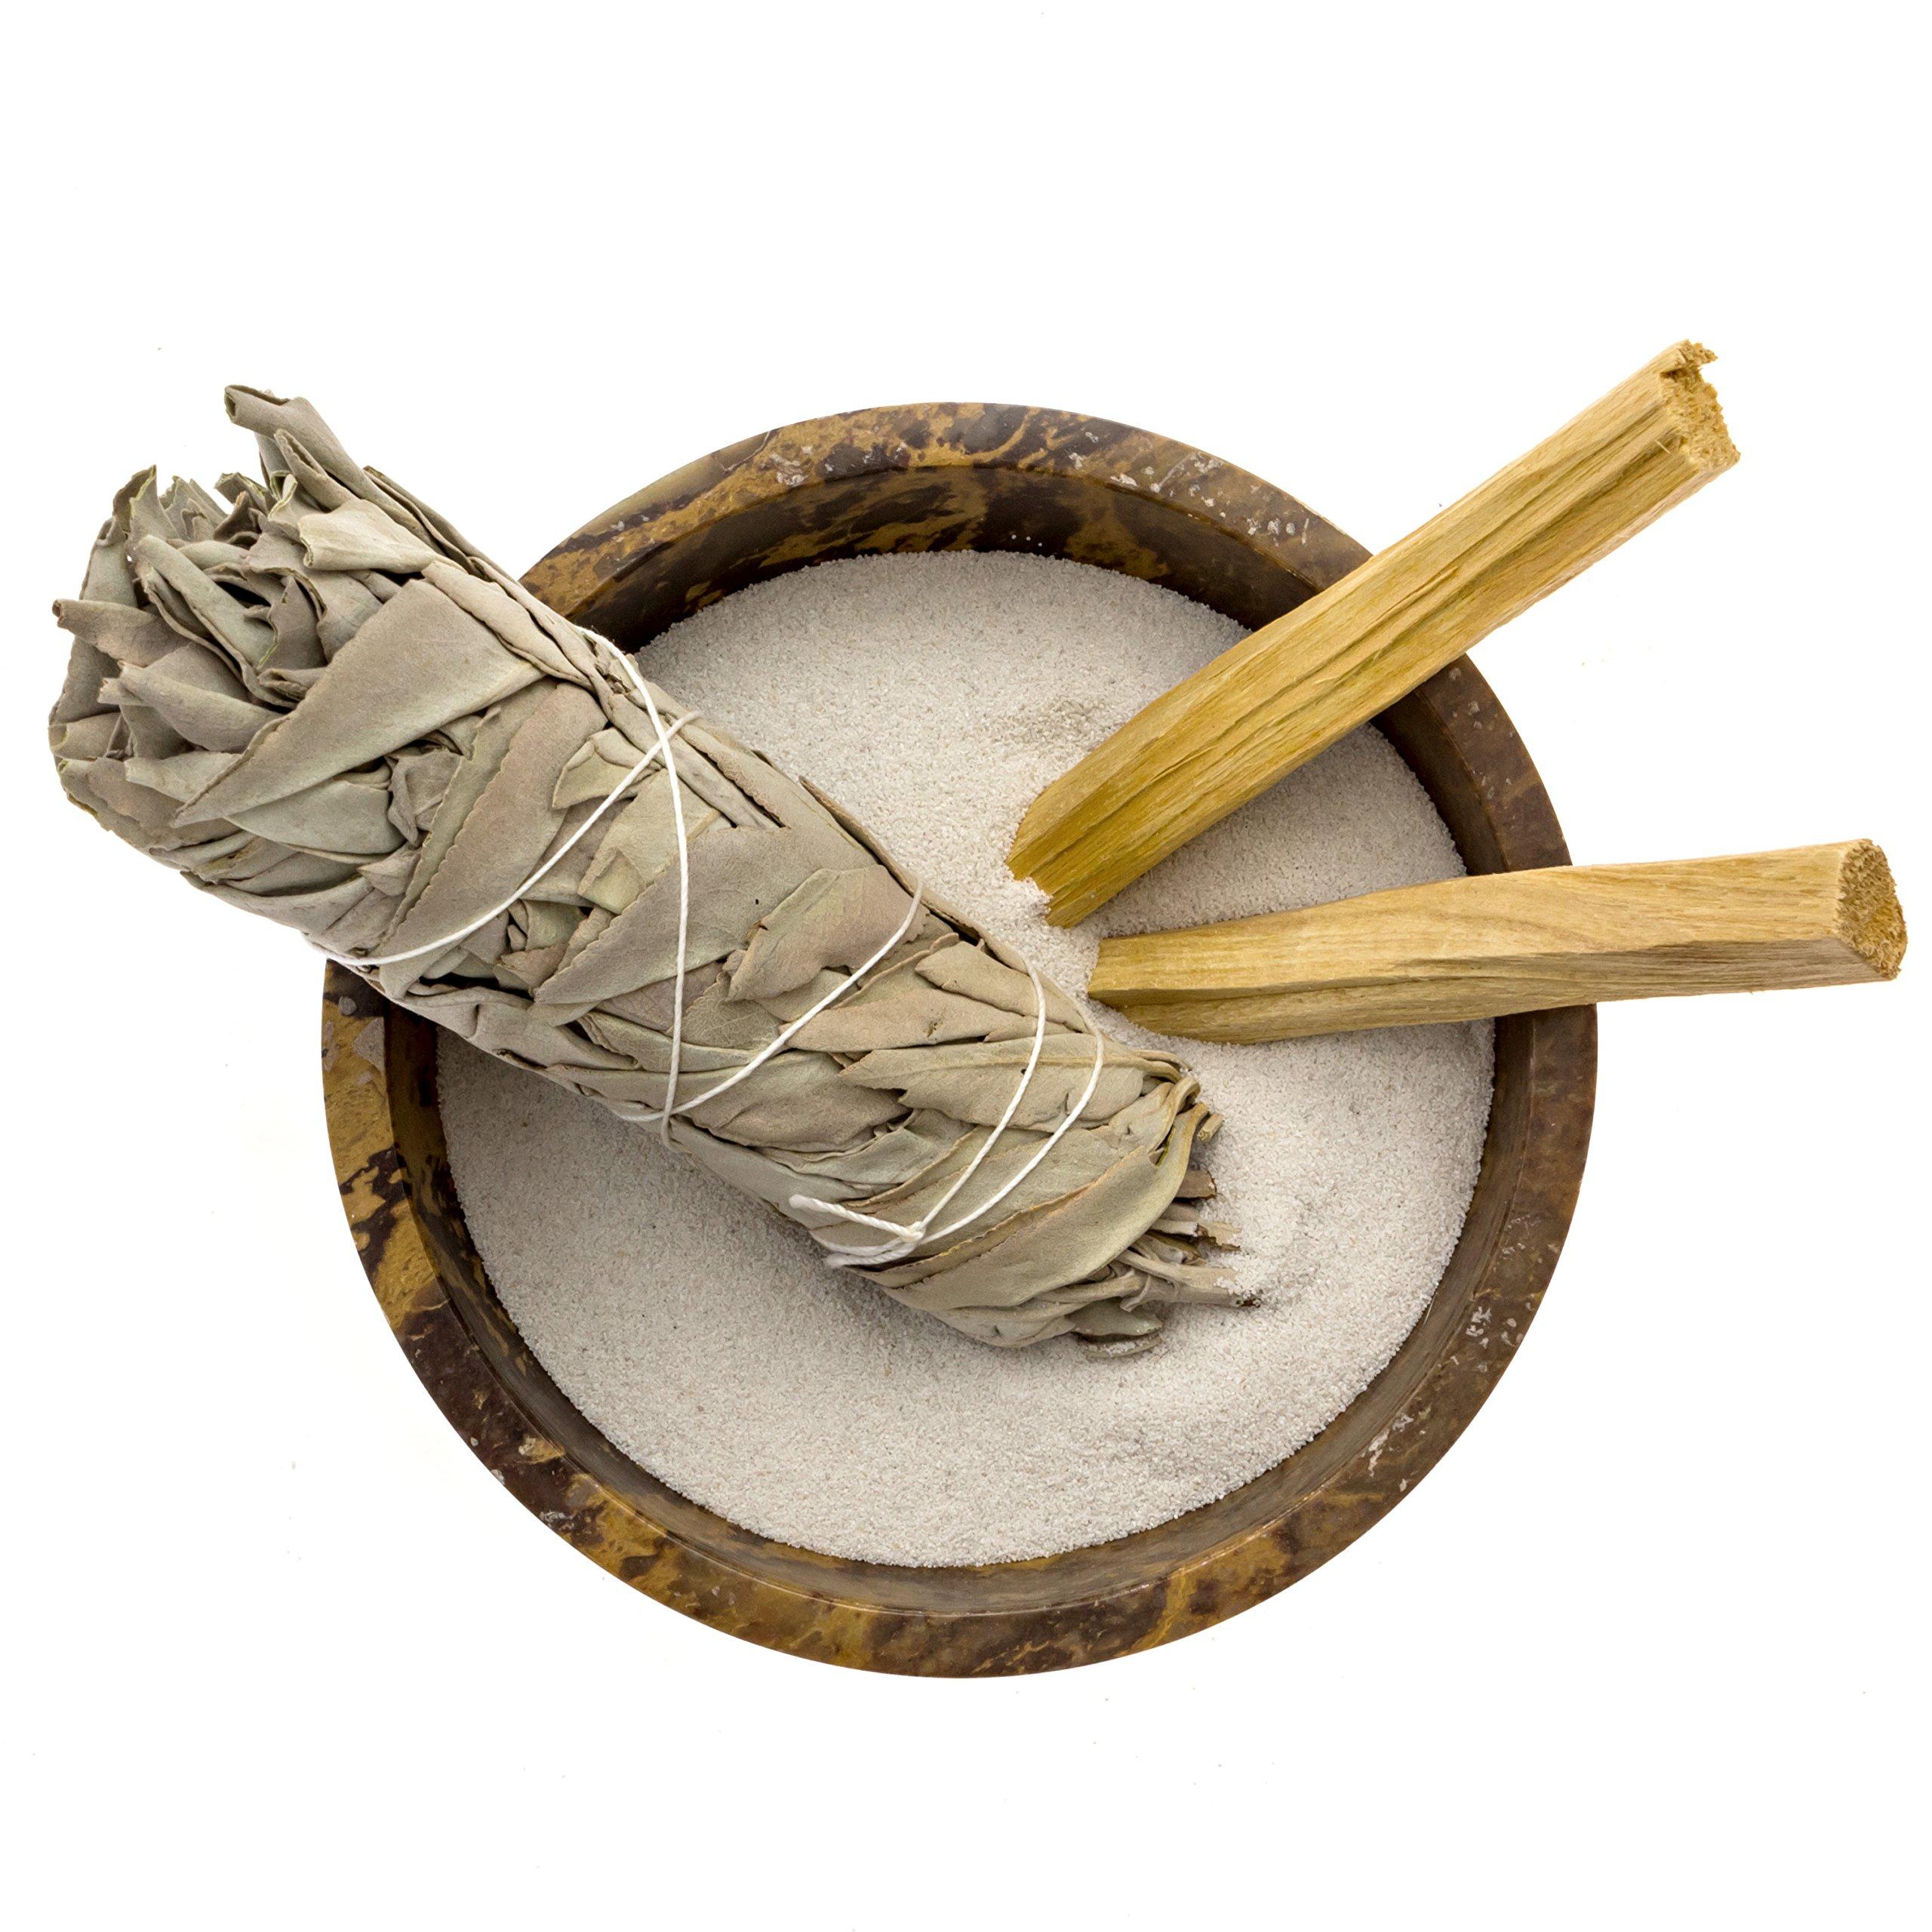 Alternative Imagination Soapstone Smudge Bowl Kit with 1 California White Sage Smudge Stick, 2 Palo Santo Smudge Sticks, and 1/2 lb of White Sand (Deluxe) by Alternative Imagination (Image #3)